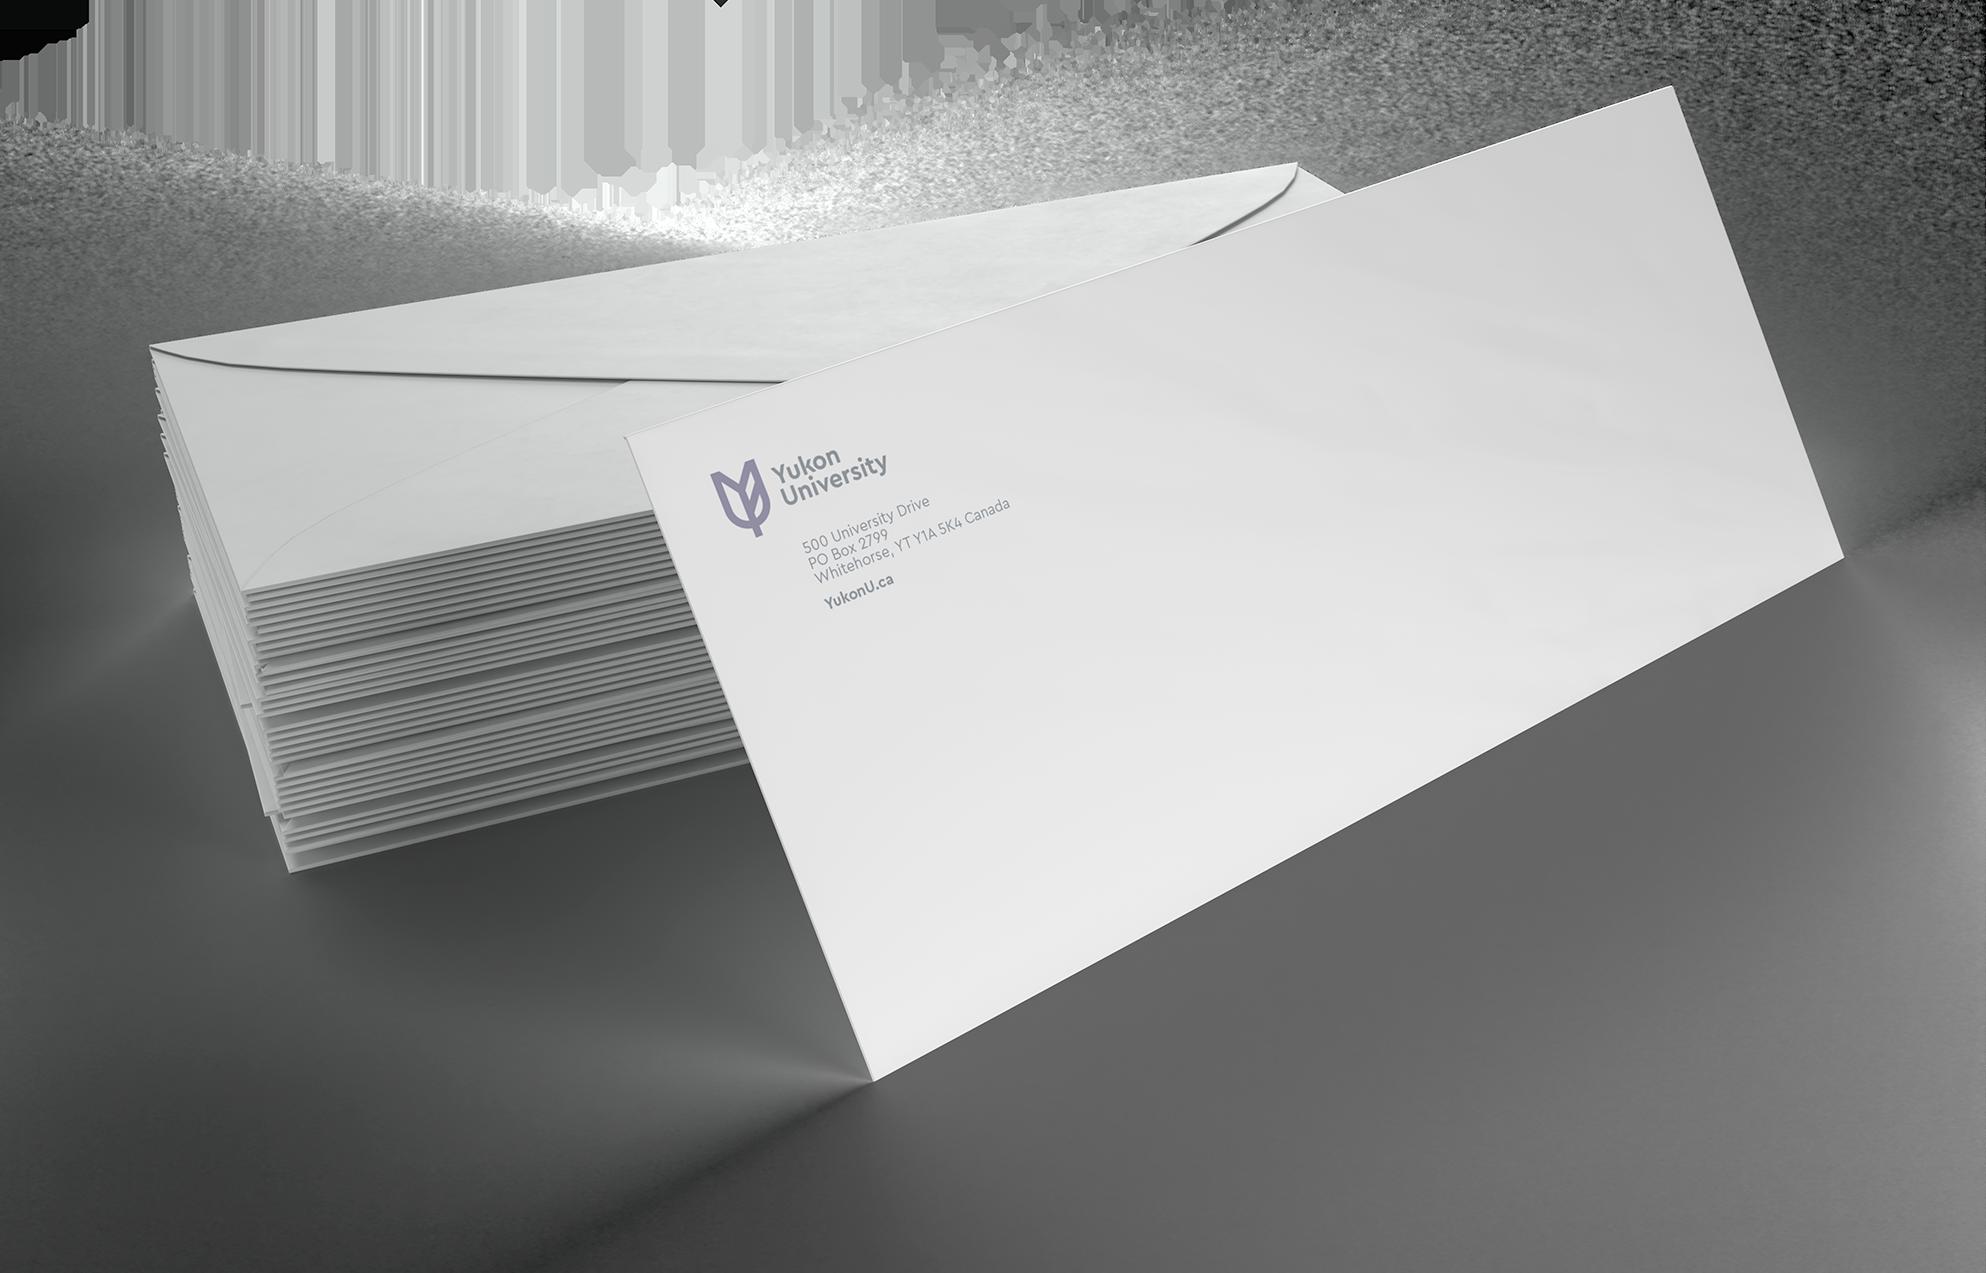 Example of Yukon University's new envelopes.